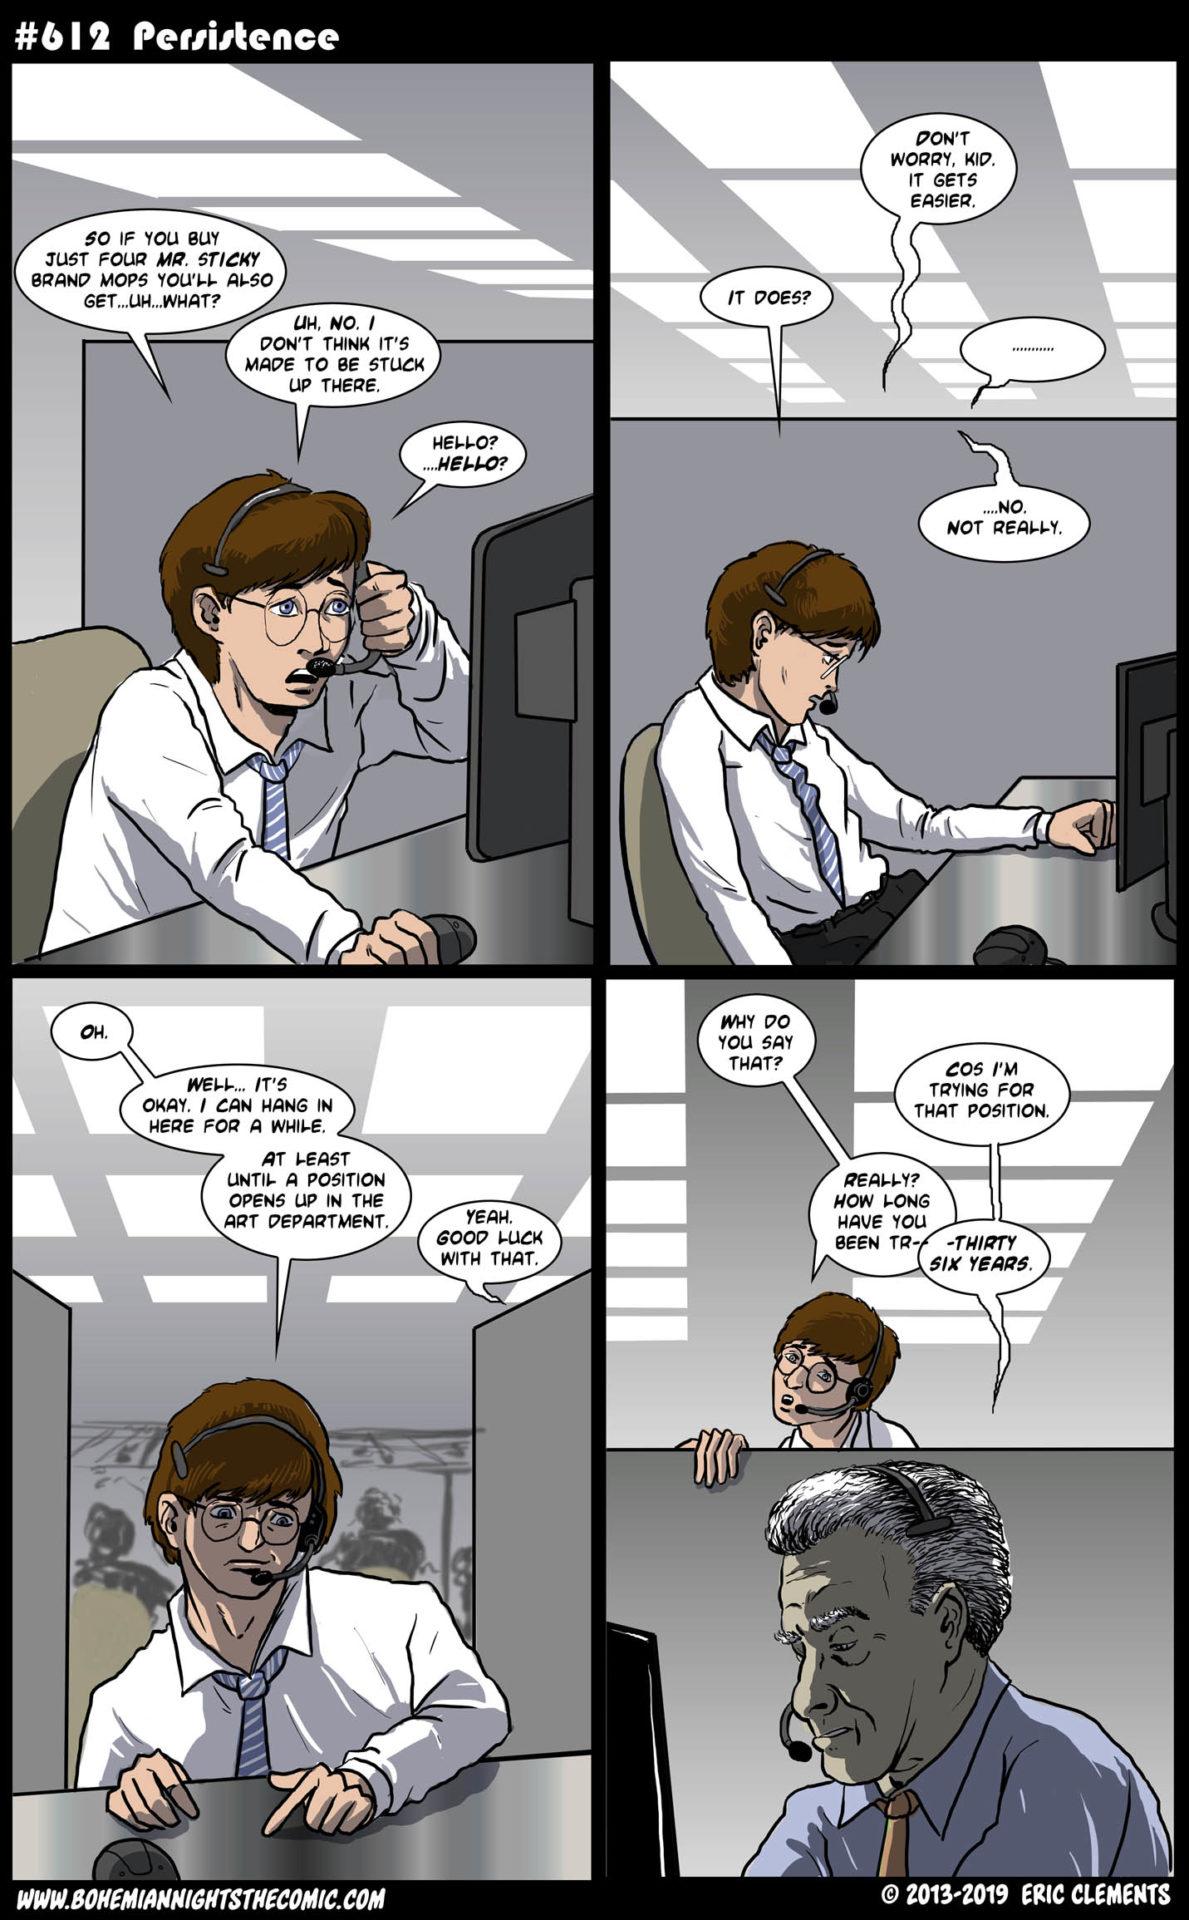 #612 Persistence